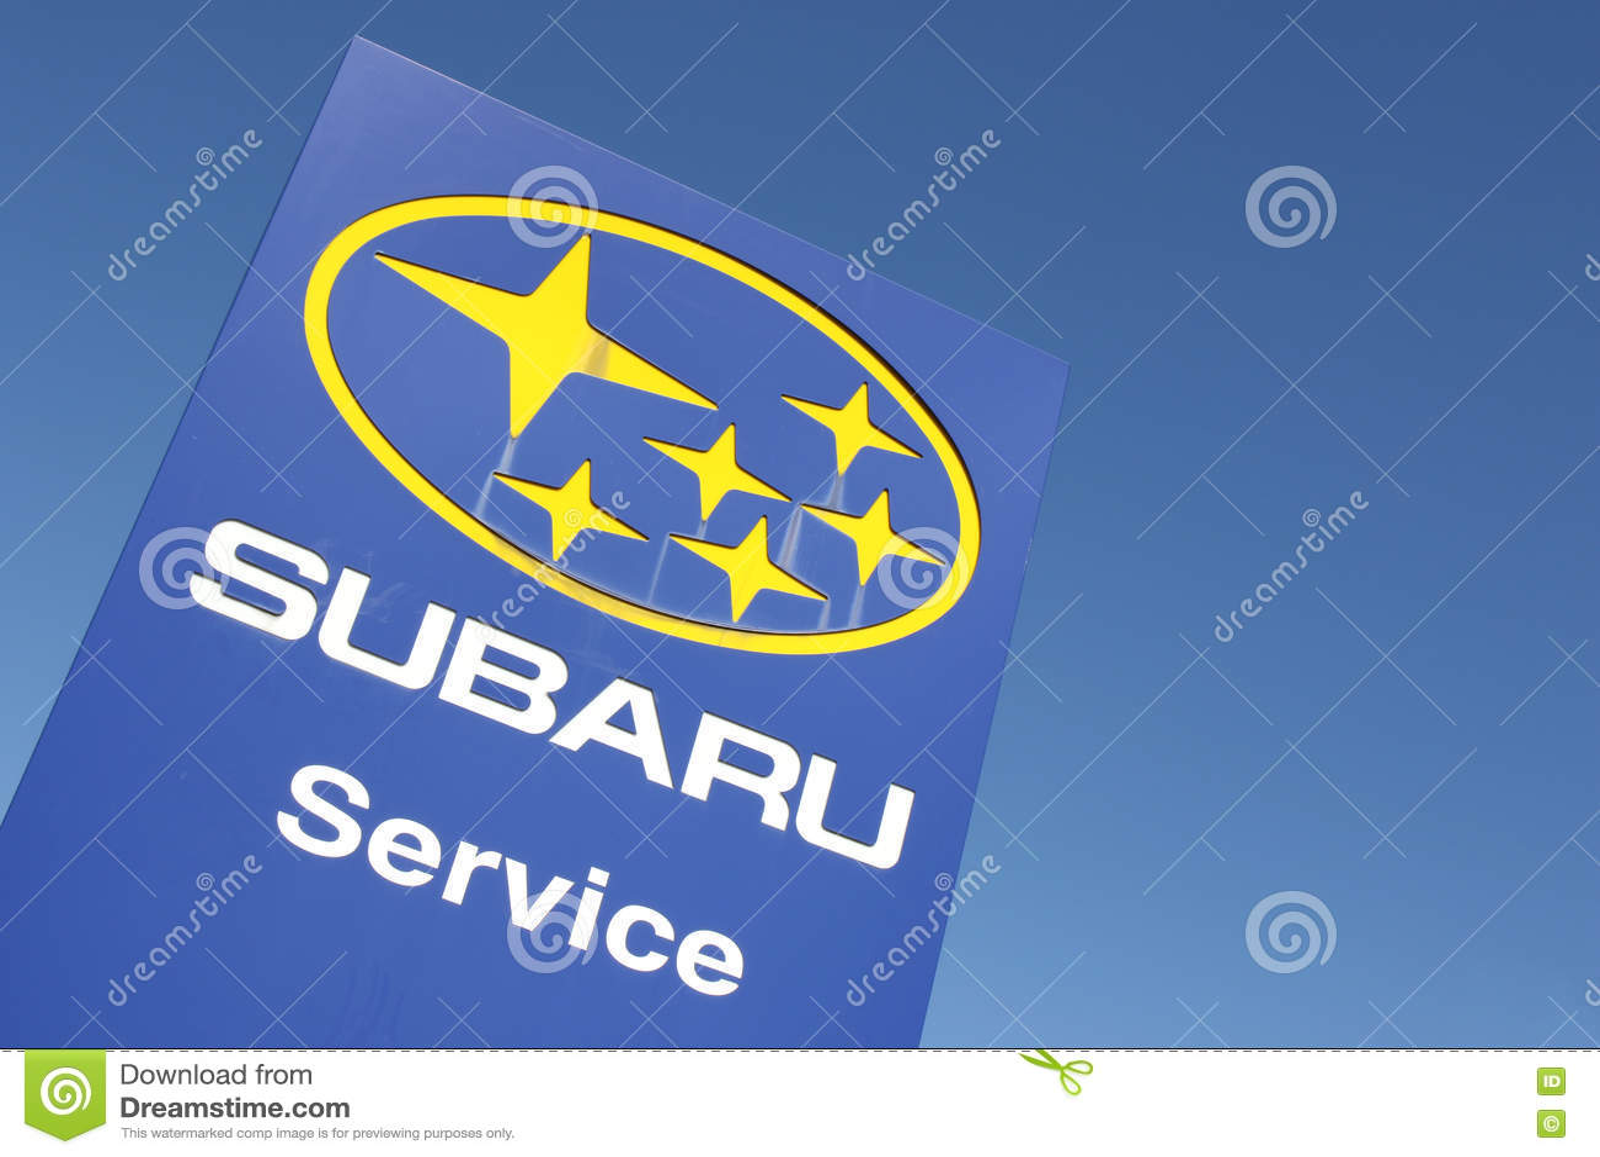 Subaru Dealership Sign Editorial Stock Image Image Of Partner